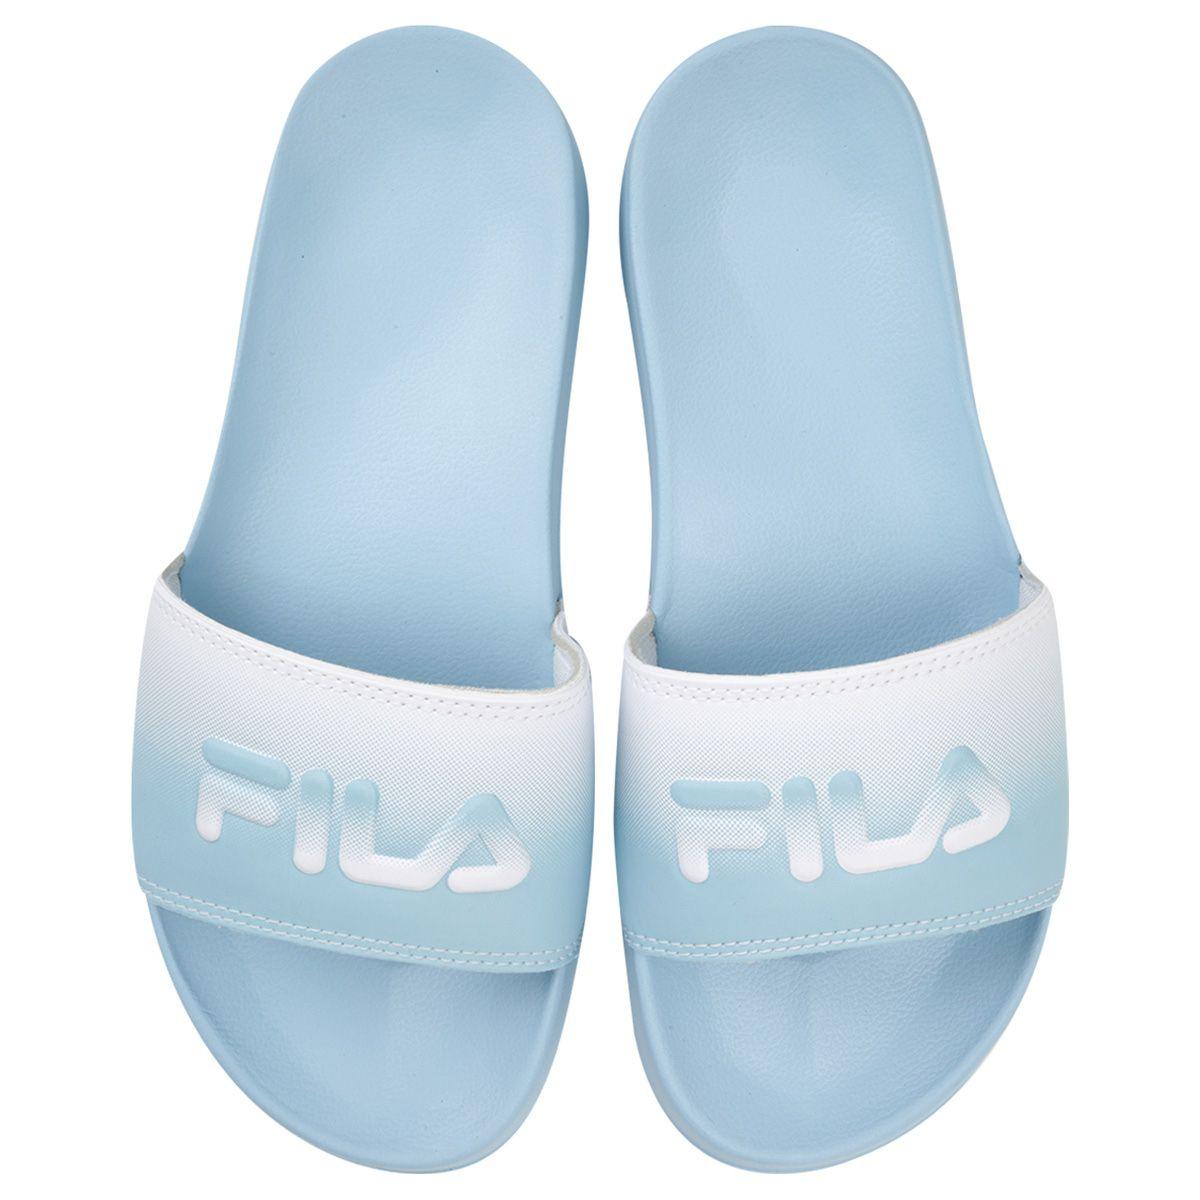 Chinelo Fila Flip Flop Drifter Style Feminino 51A018  - Ian Calçados